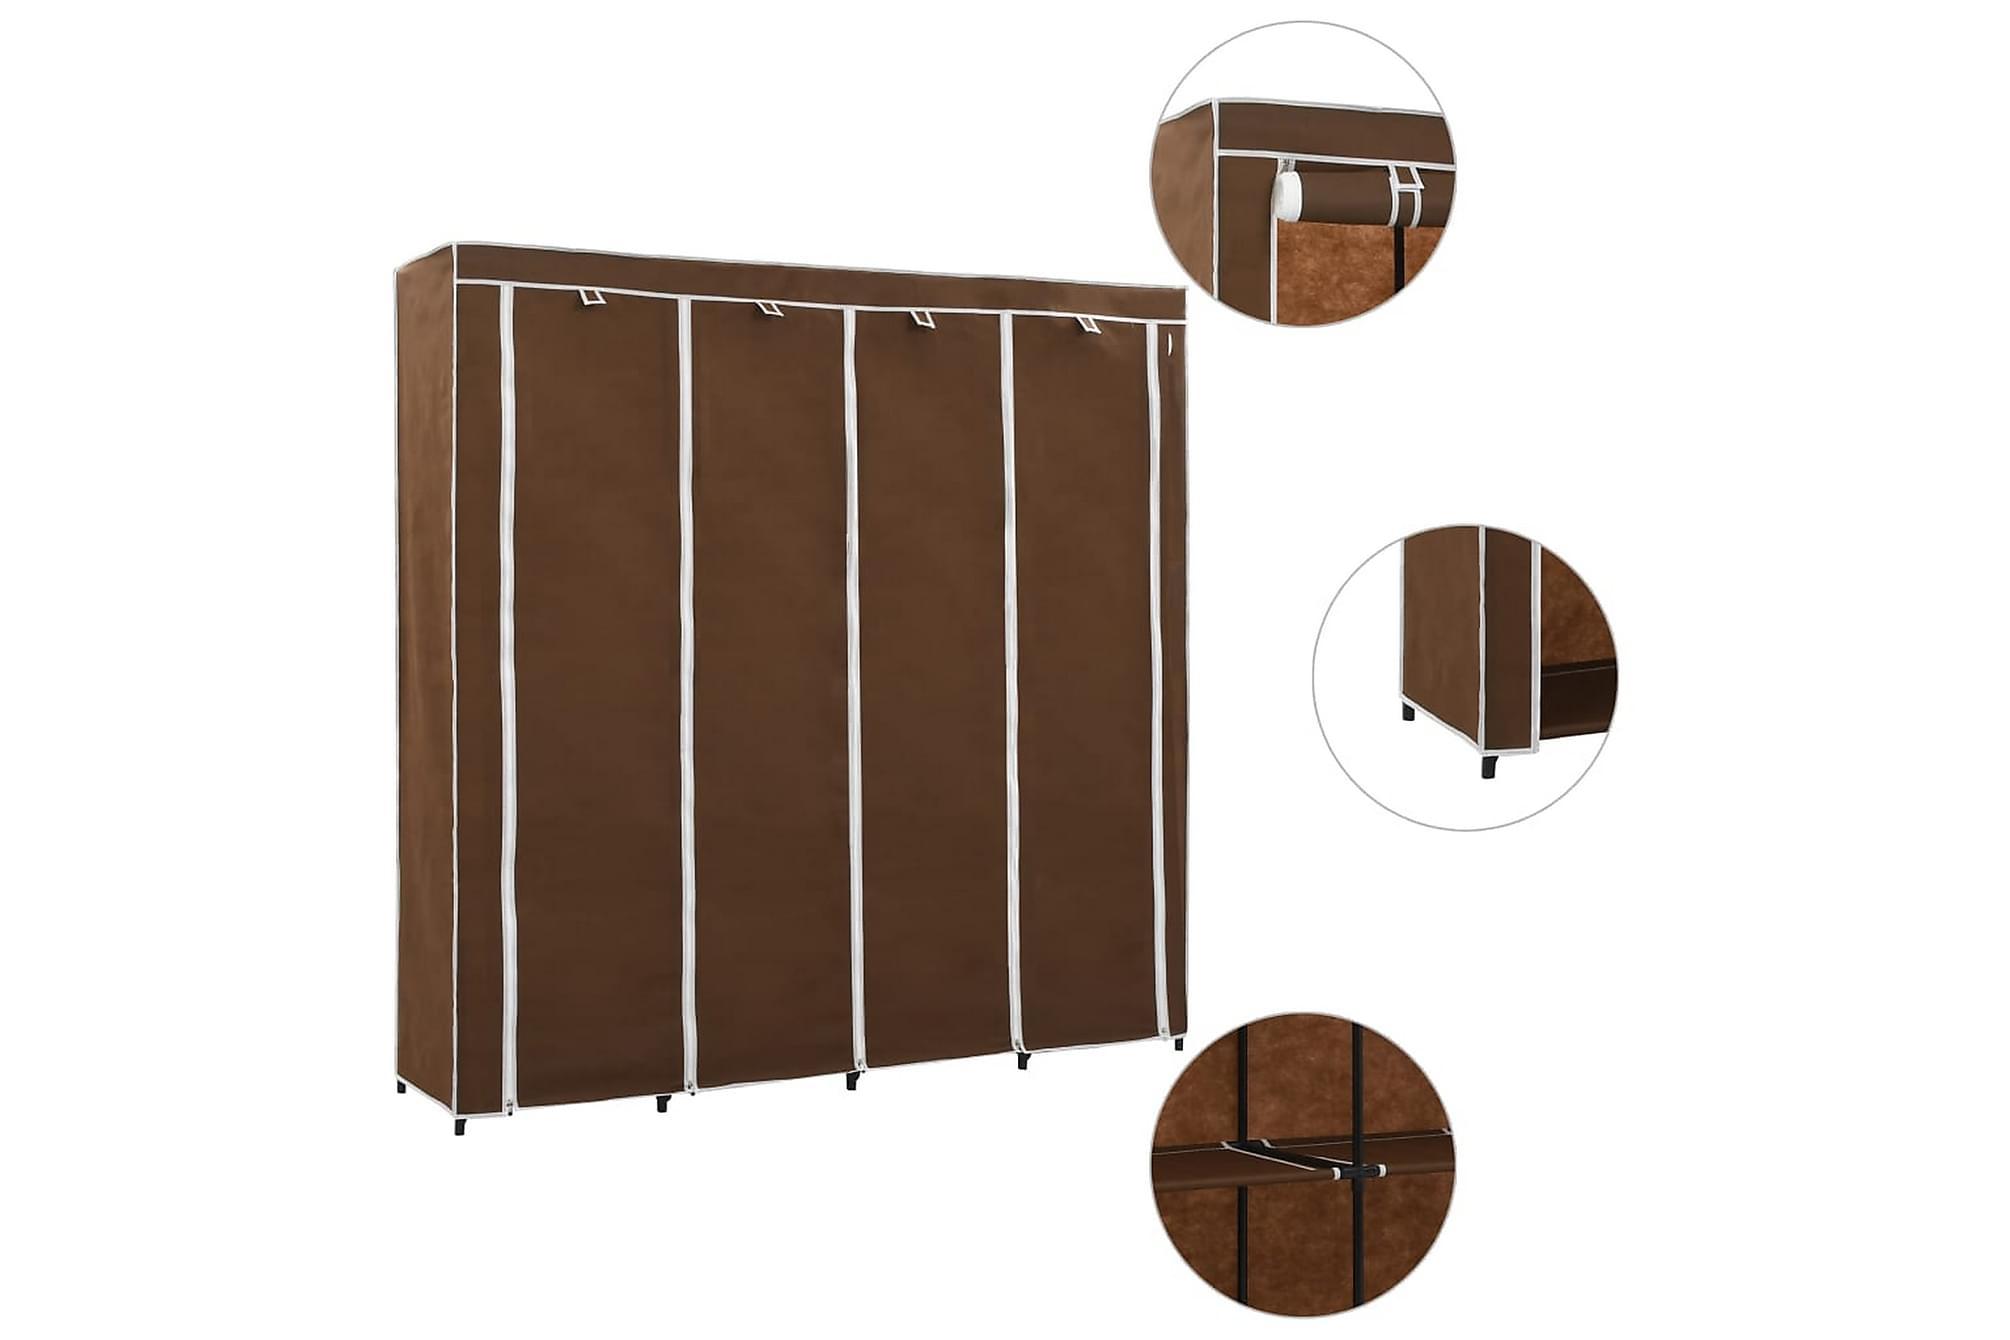 Garderob med 4 utrymmen brun 175x45x170 cm